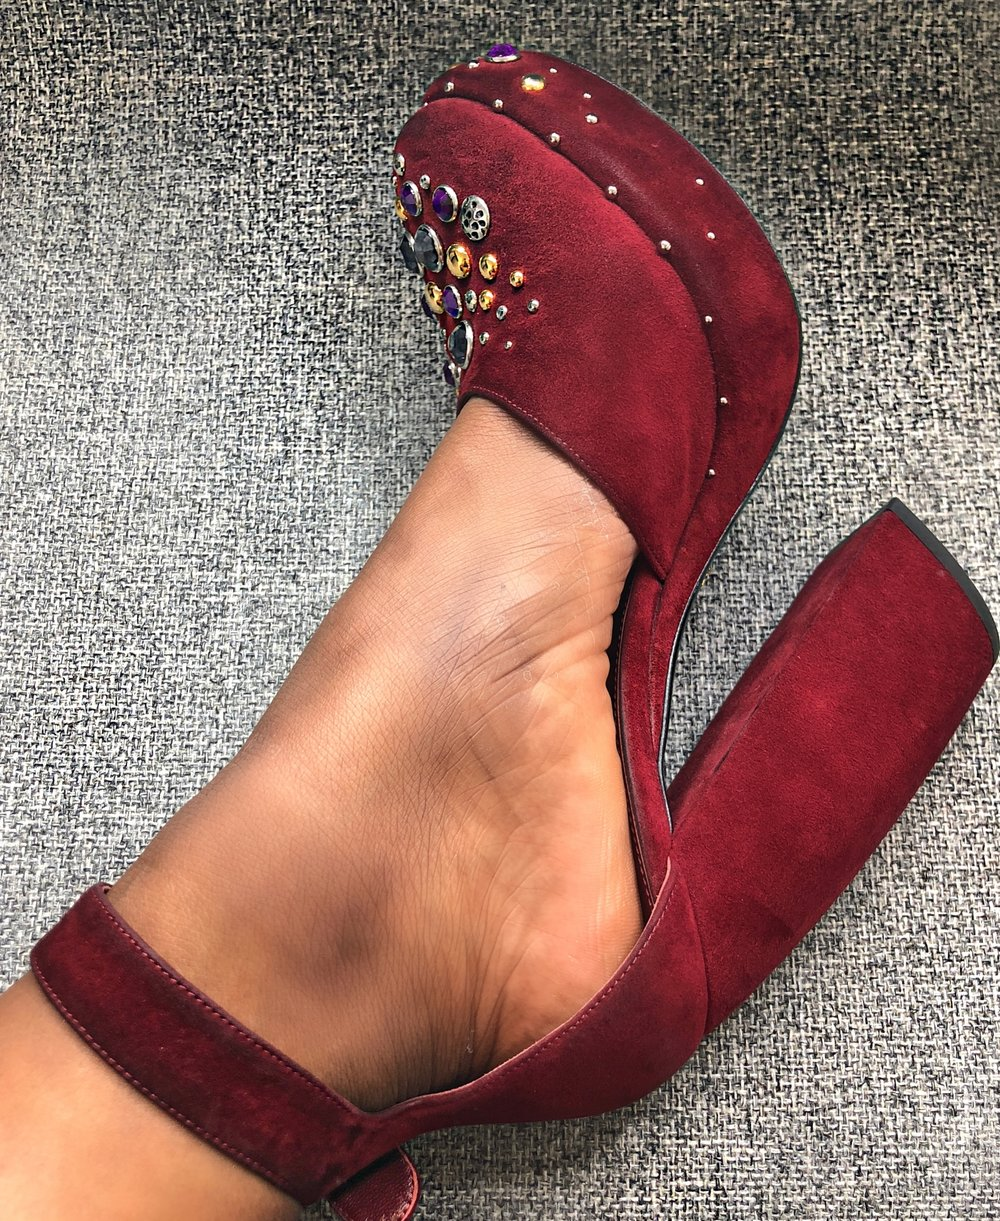 Facetune shoe.JPG